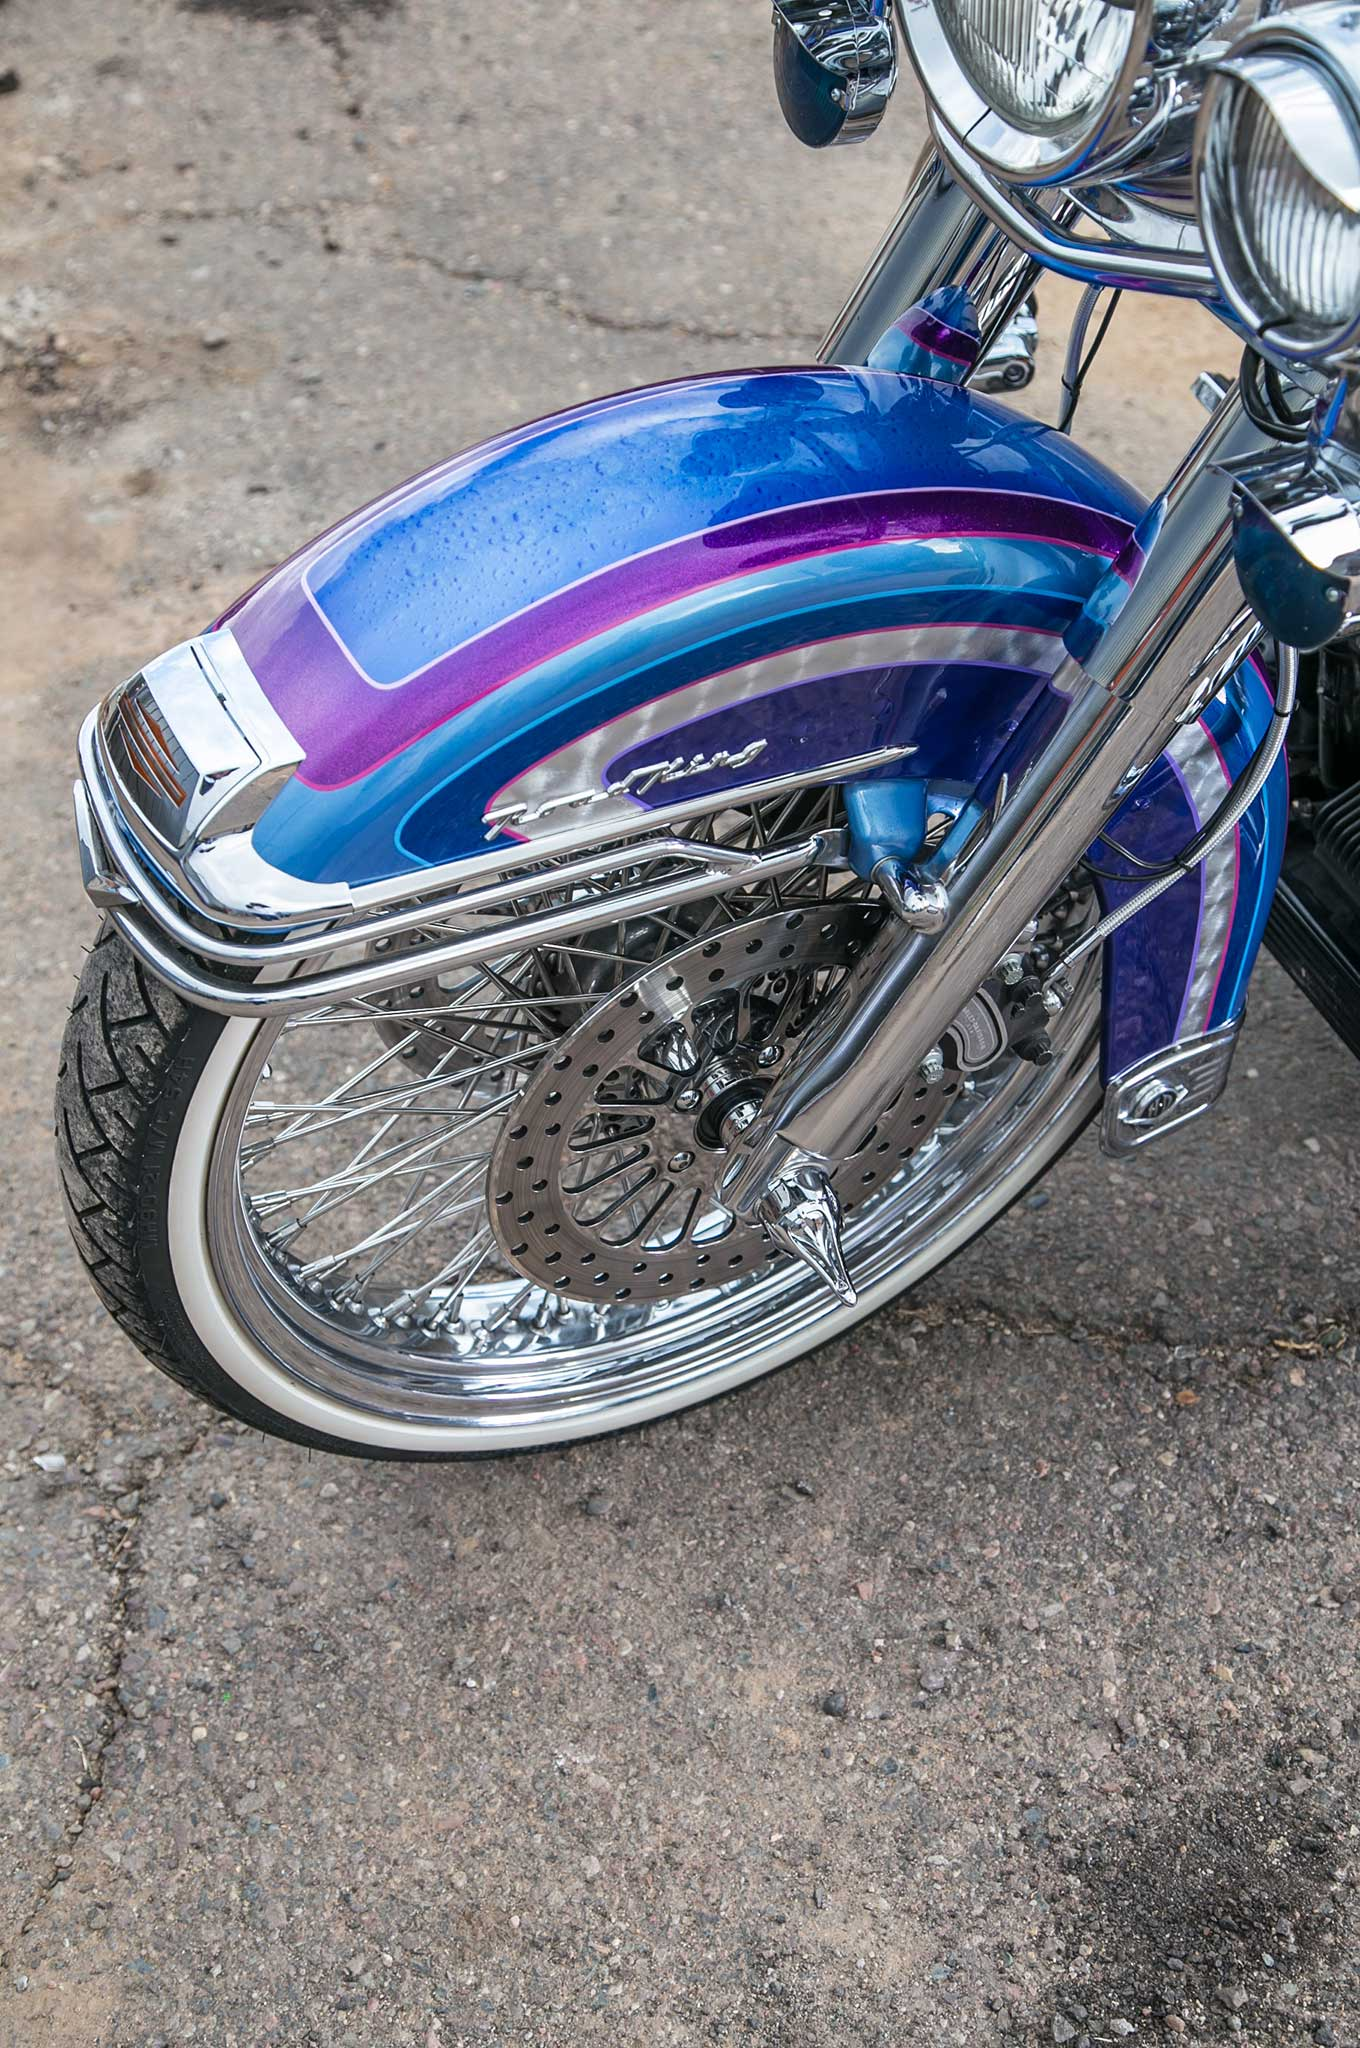 2001 Harley-Davidson Road King - Old Habits Die Hard ...